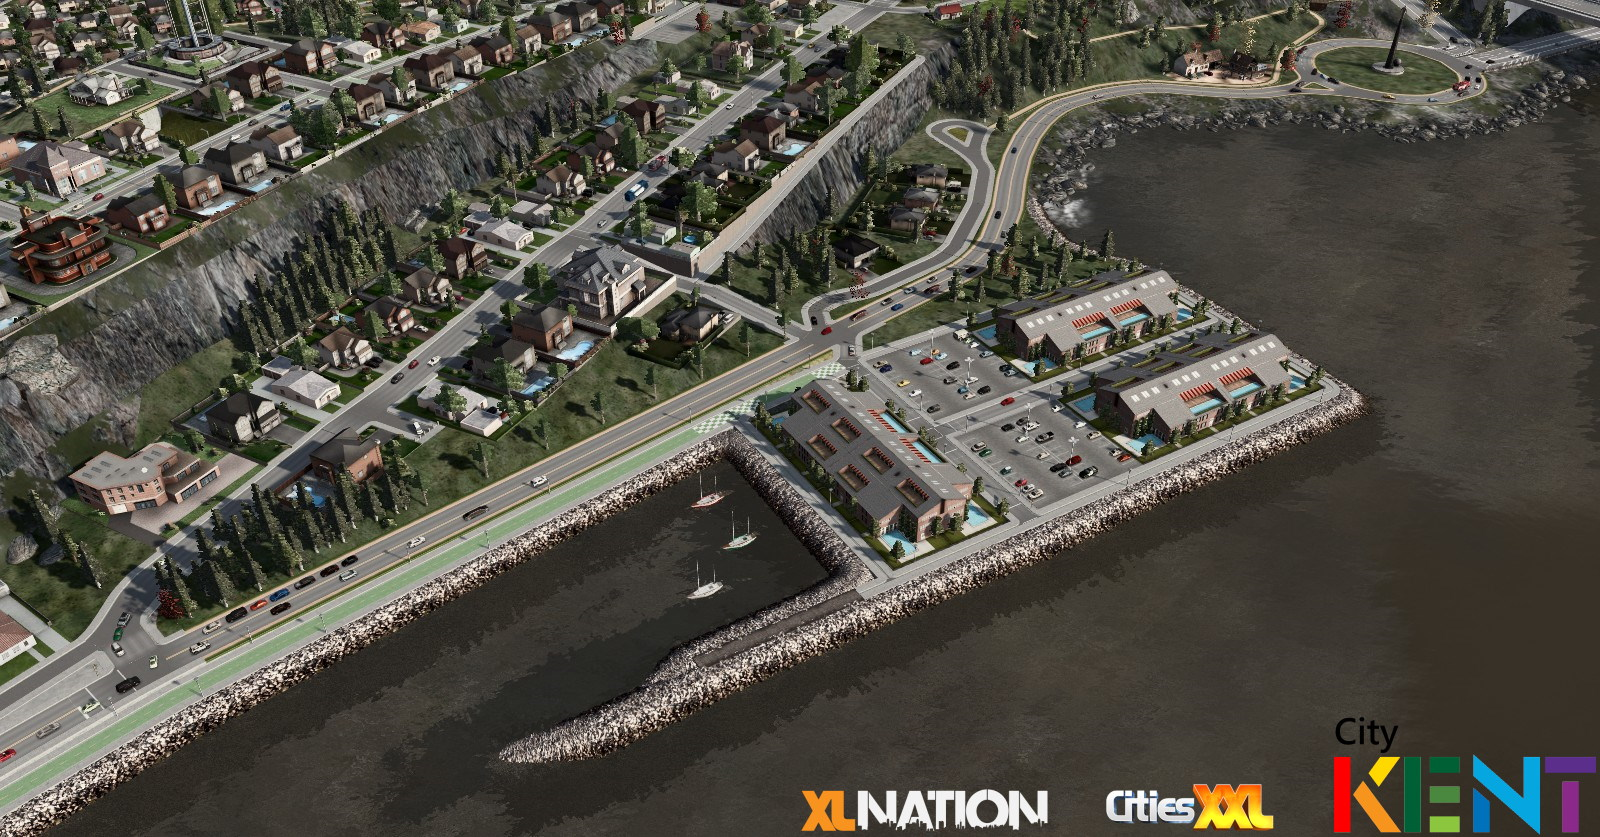 Petty Island_KENT_04_XLN_CitiesXXL.jpg